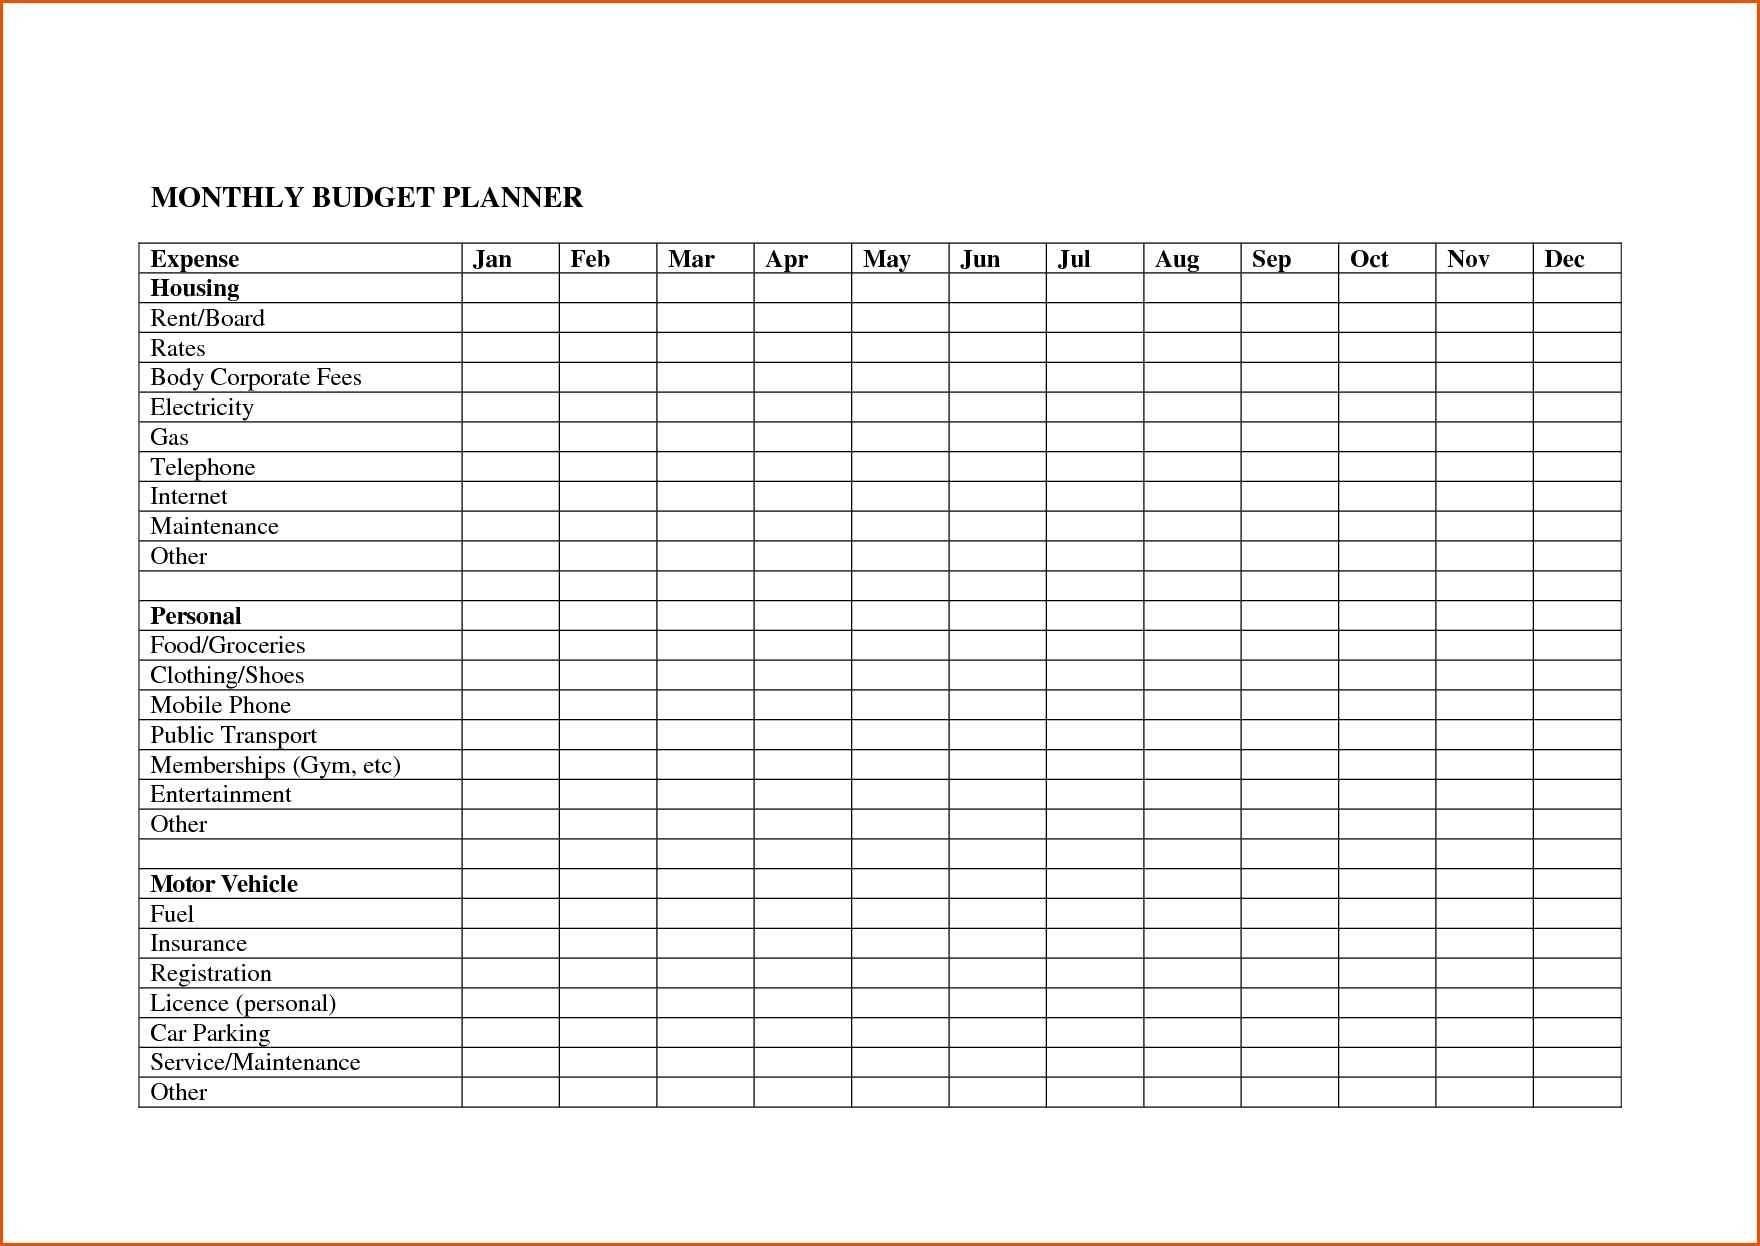 Household Bills Spreadsheet Template with regard to Examplef Household Budget Spreadsheet Template Worksheet Best Photos